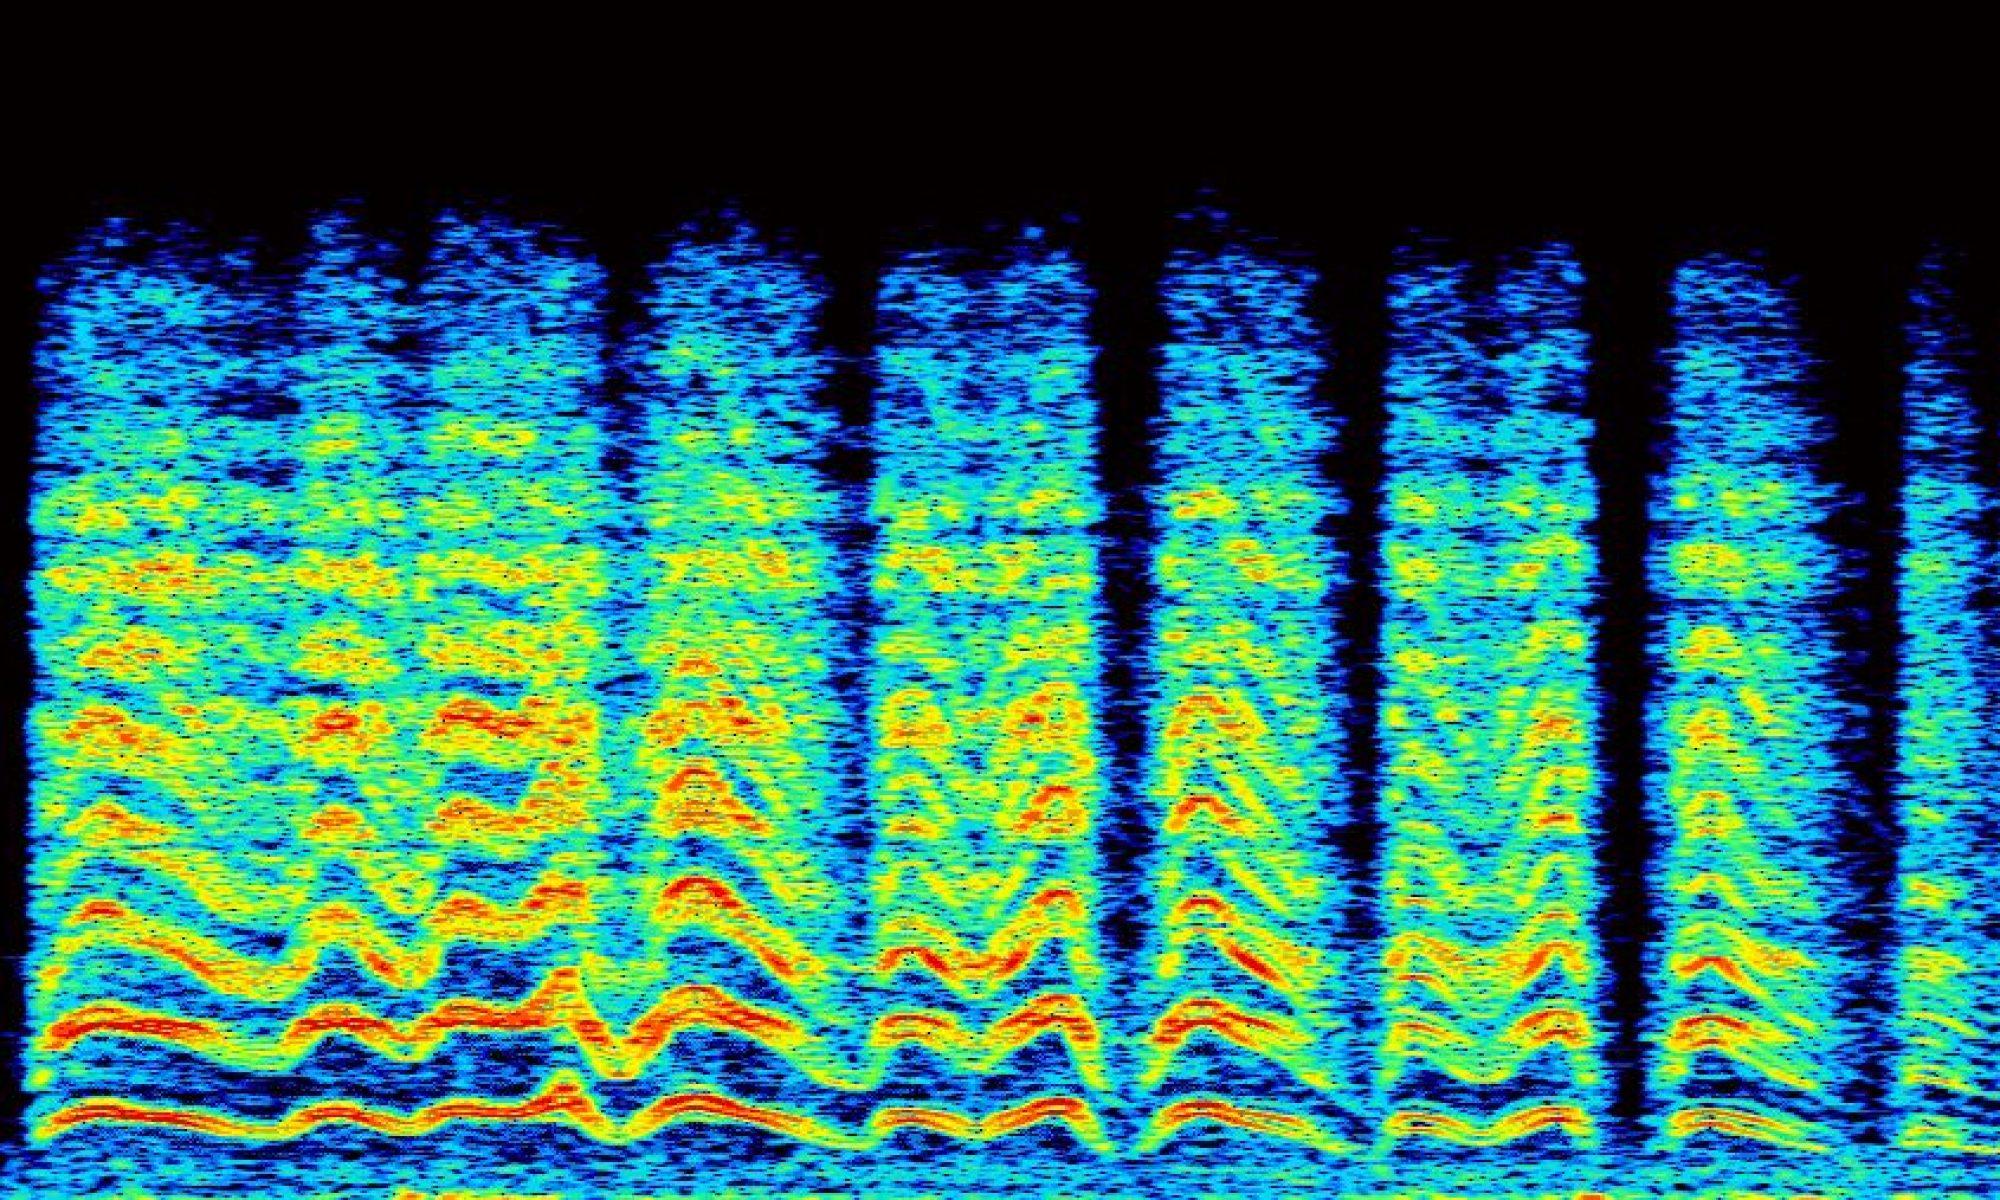 Acoustic Communications